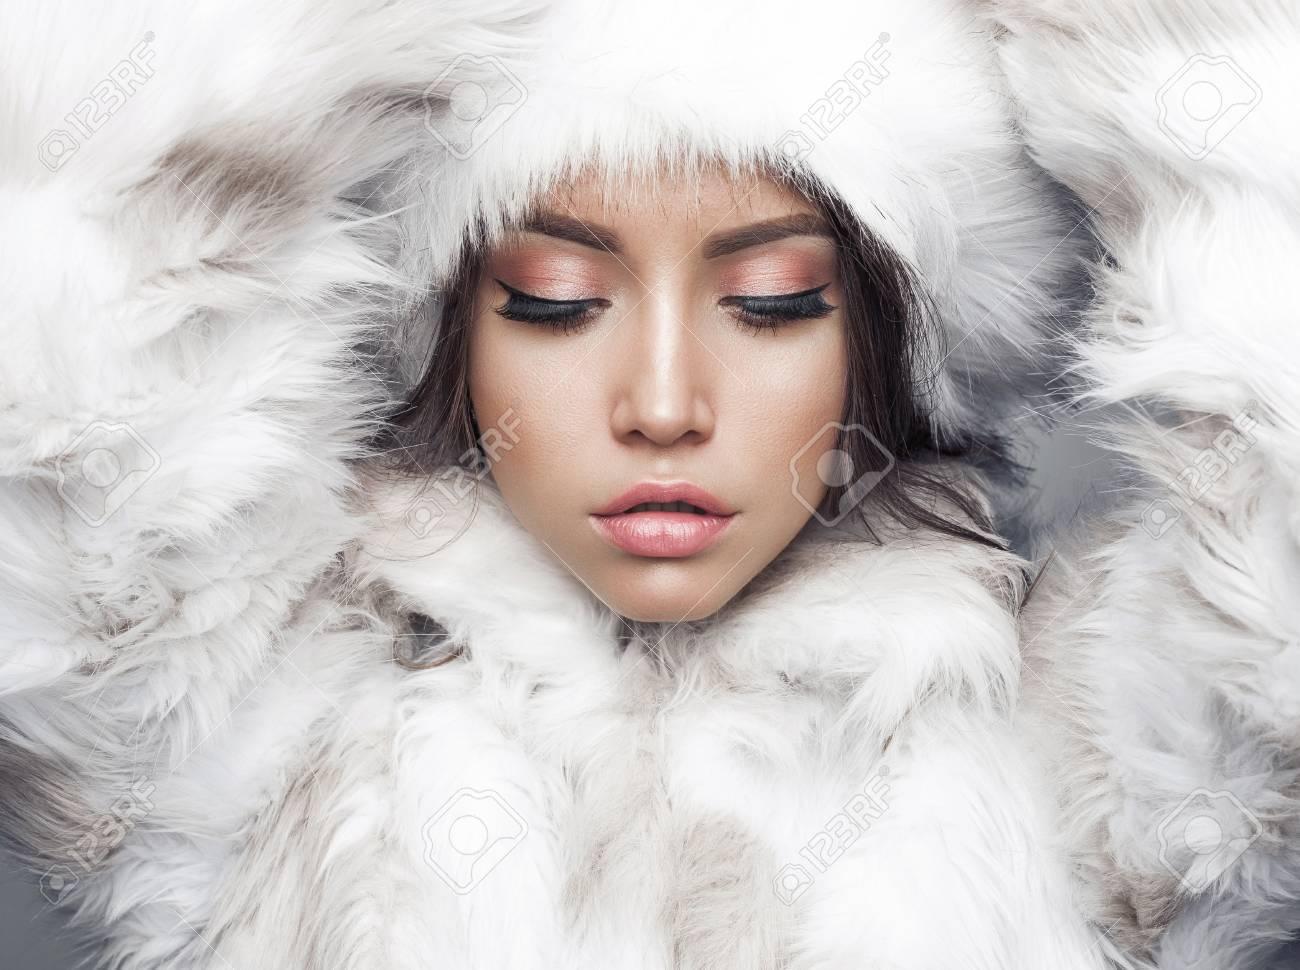 Fashion studio portrait of beautiful lady in white fur coat and fur hat. Winter beauty in luxury. Fashion fur. Beautiful woman in luxury fur coat. Fashion model posing in eco-fur coat and eco-fur hat - 88772988